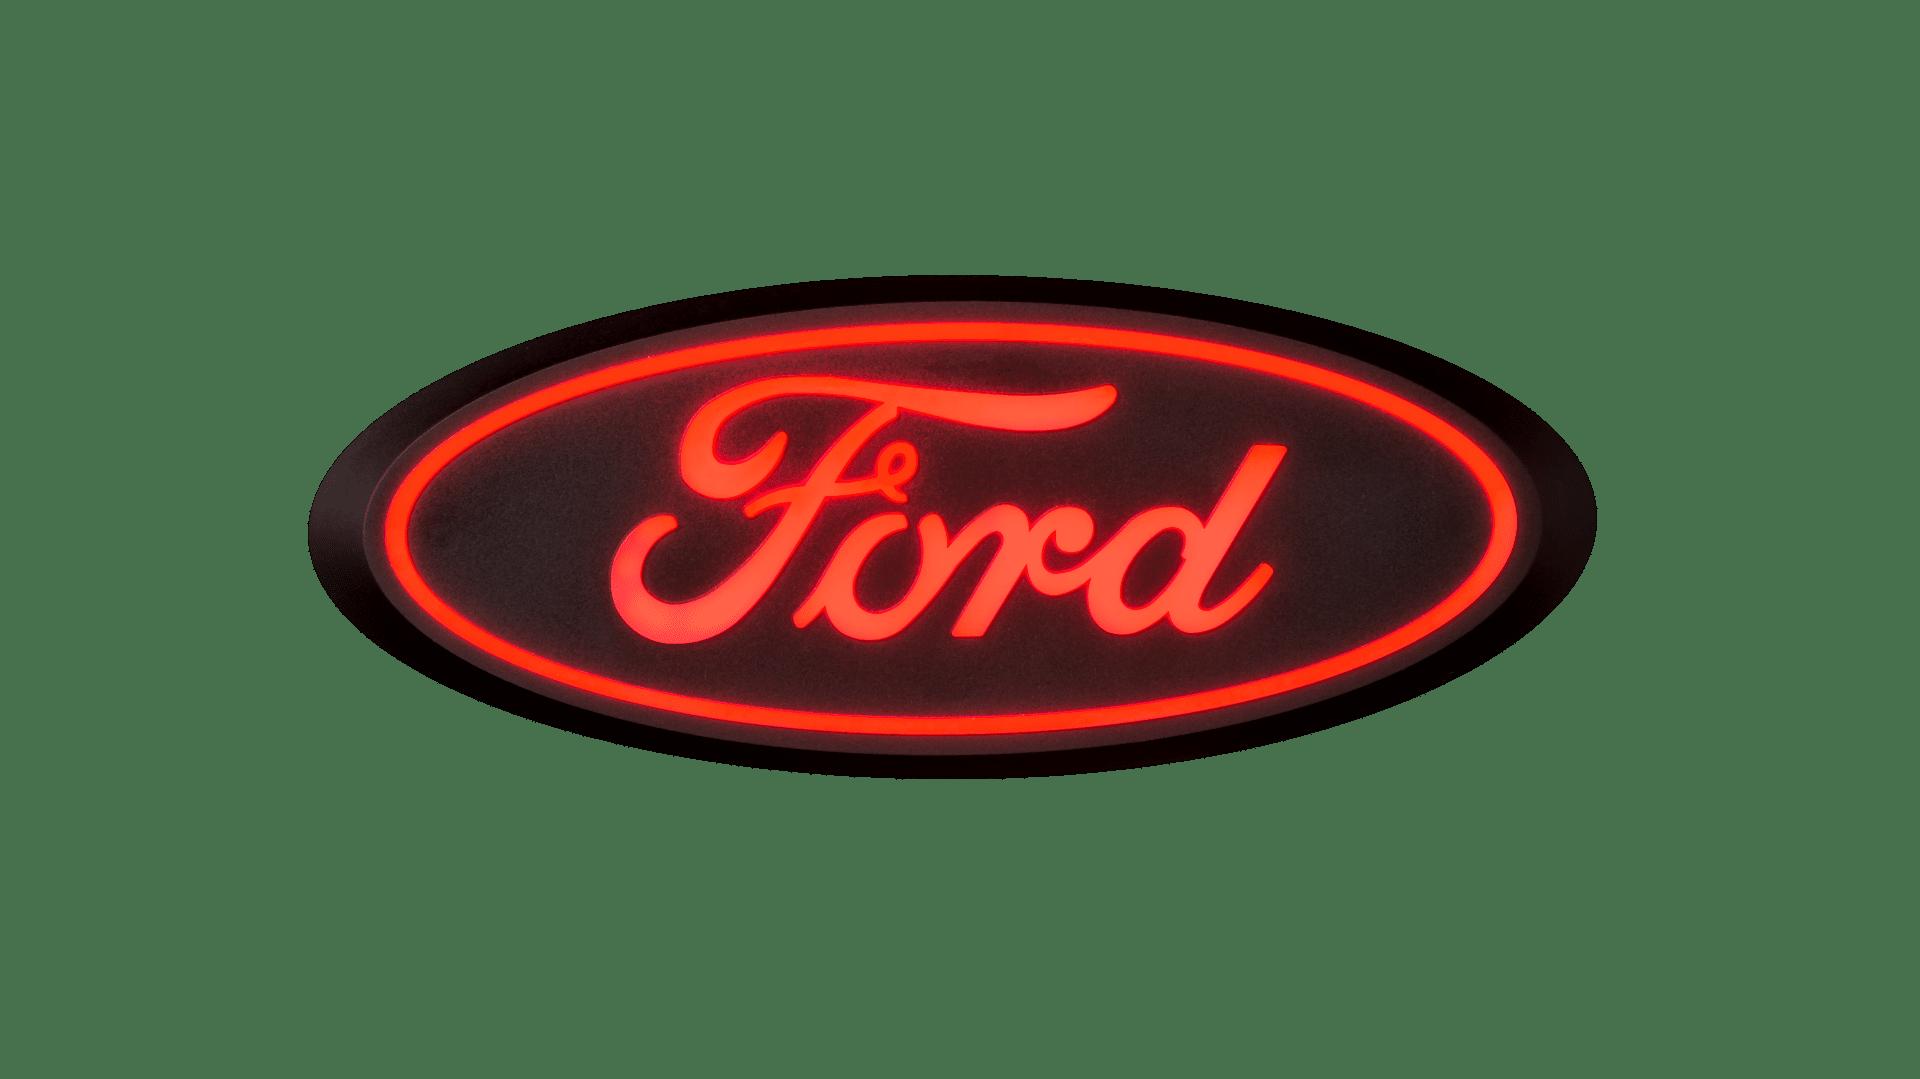 Ford LED Emblem - Red for Rear